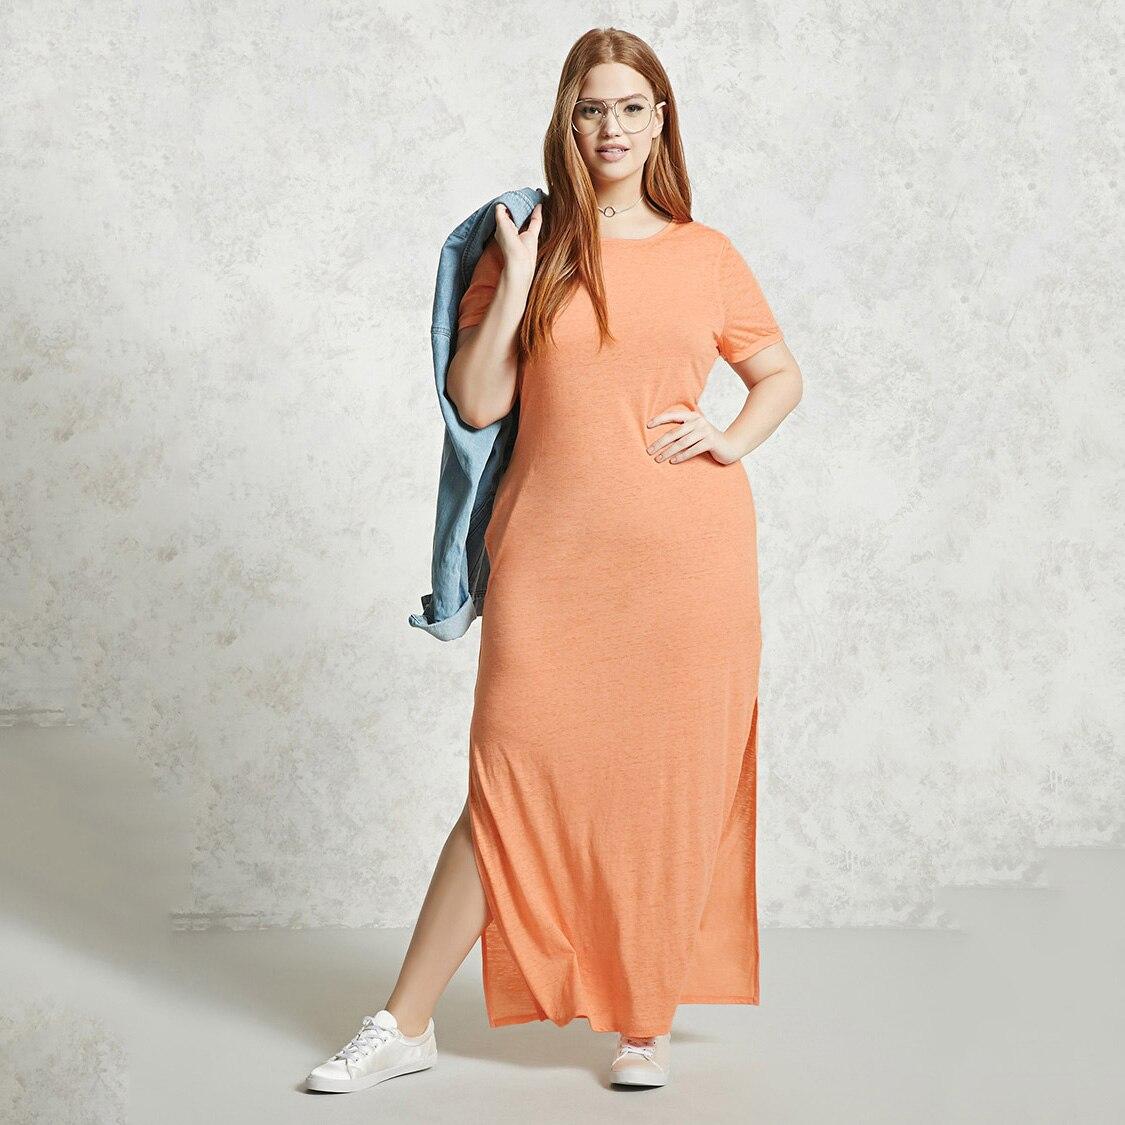 Size 4 maxi dress short